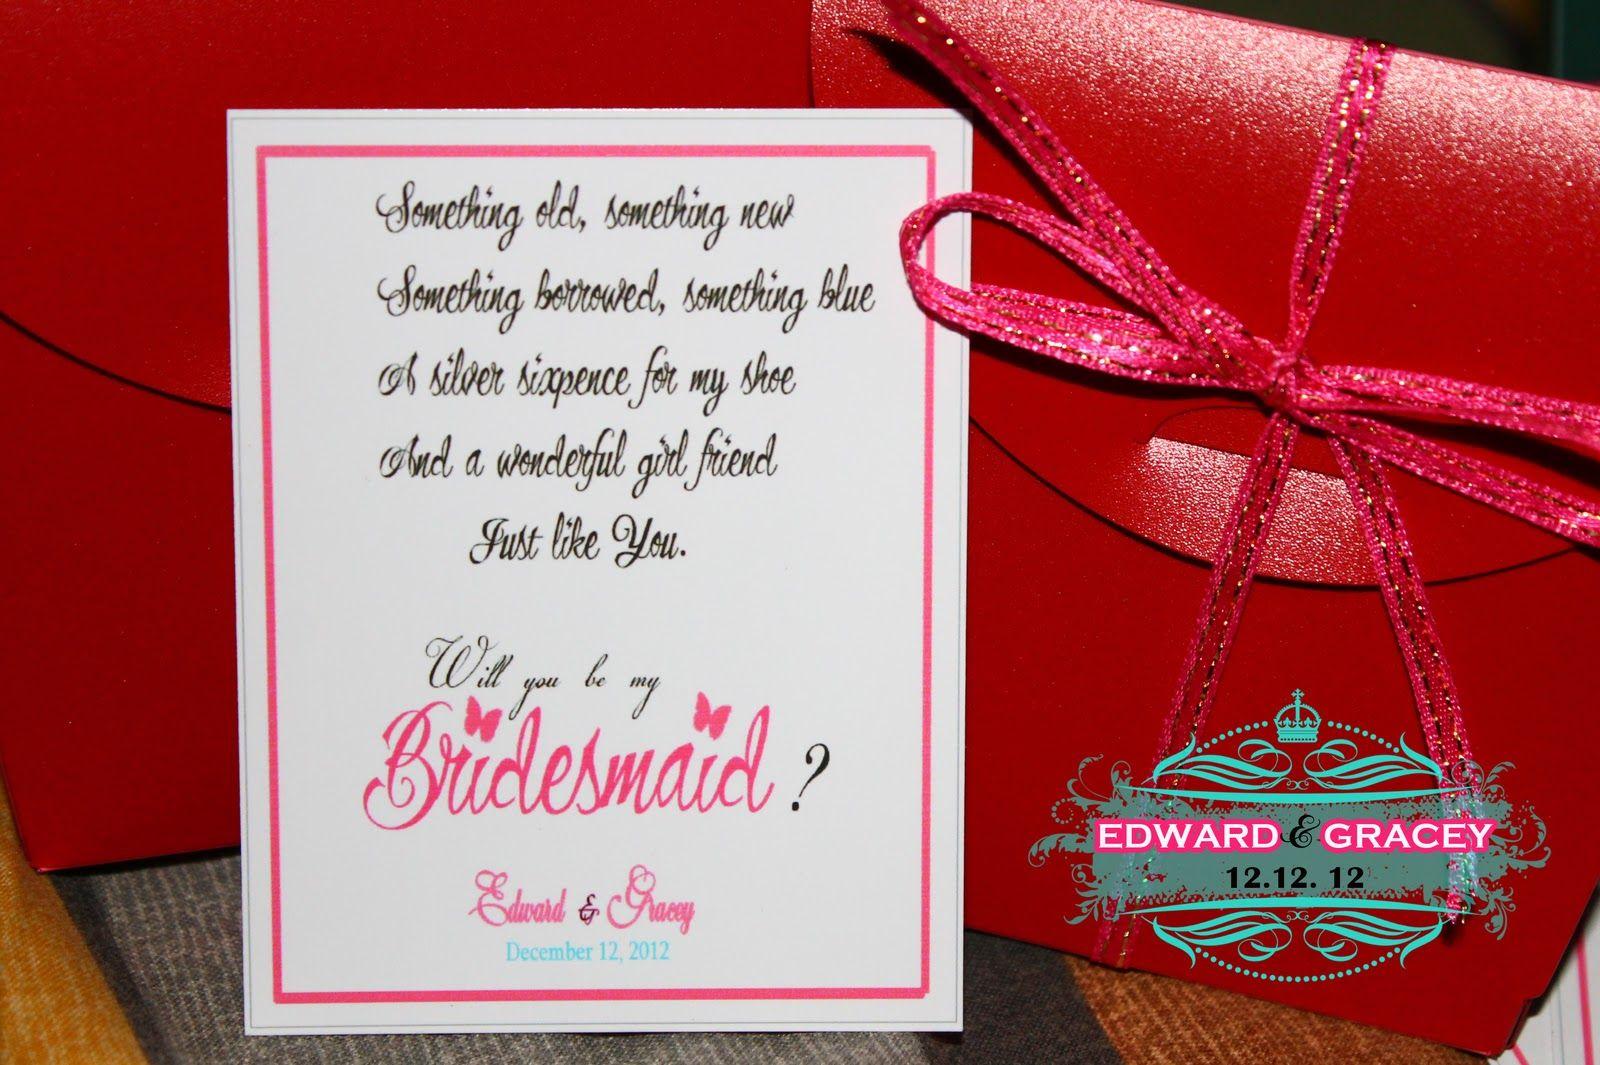 bridesmaid poem | Wedding | Pinterest | Bridesmaid poems, Wedding ...